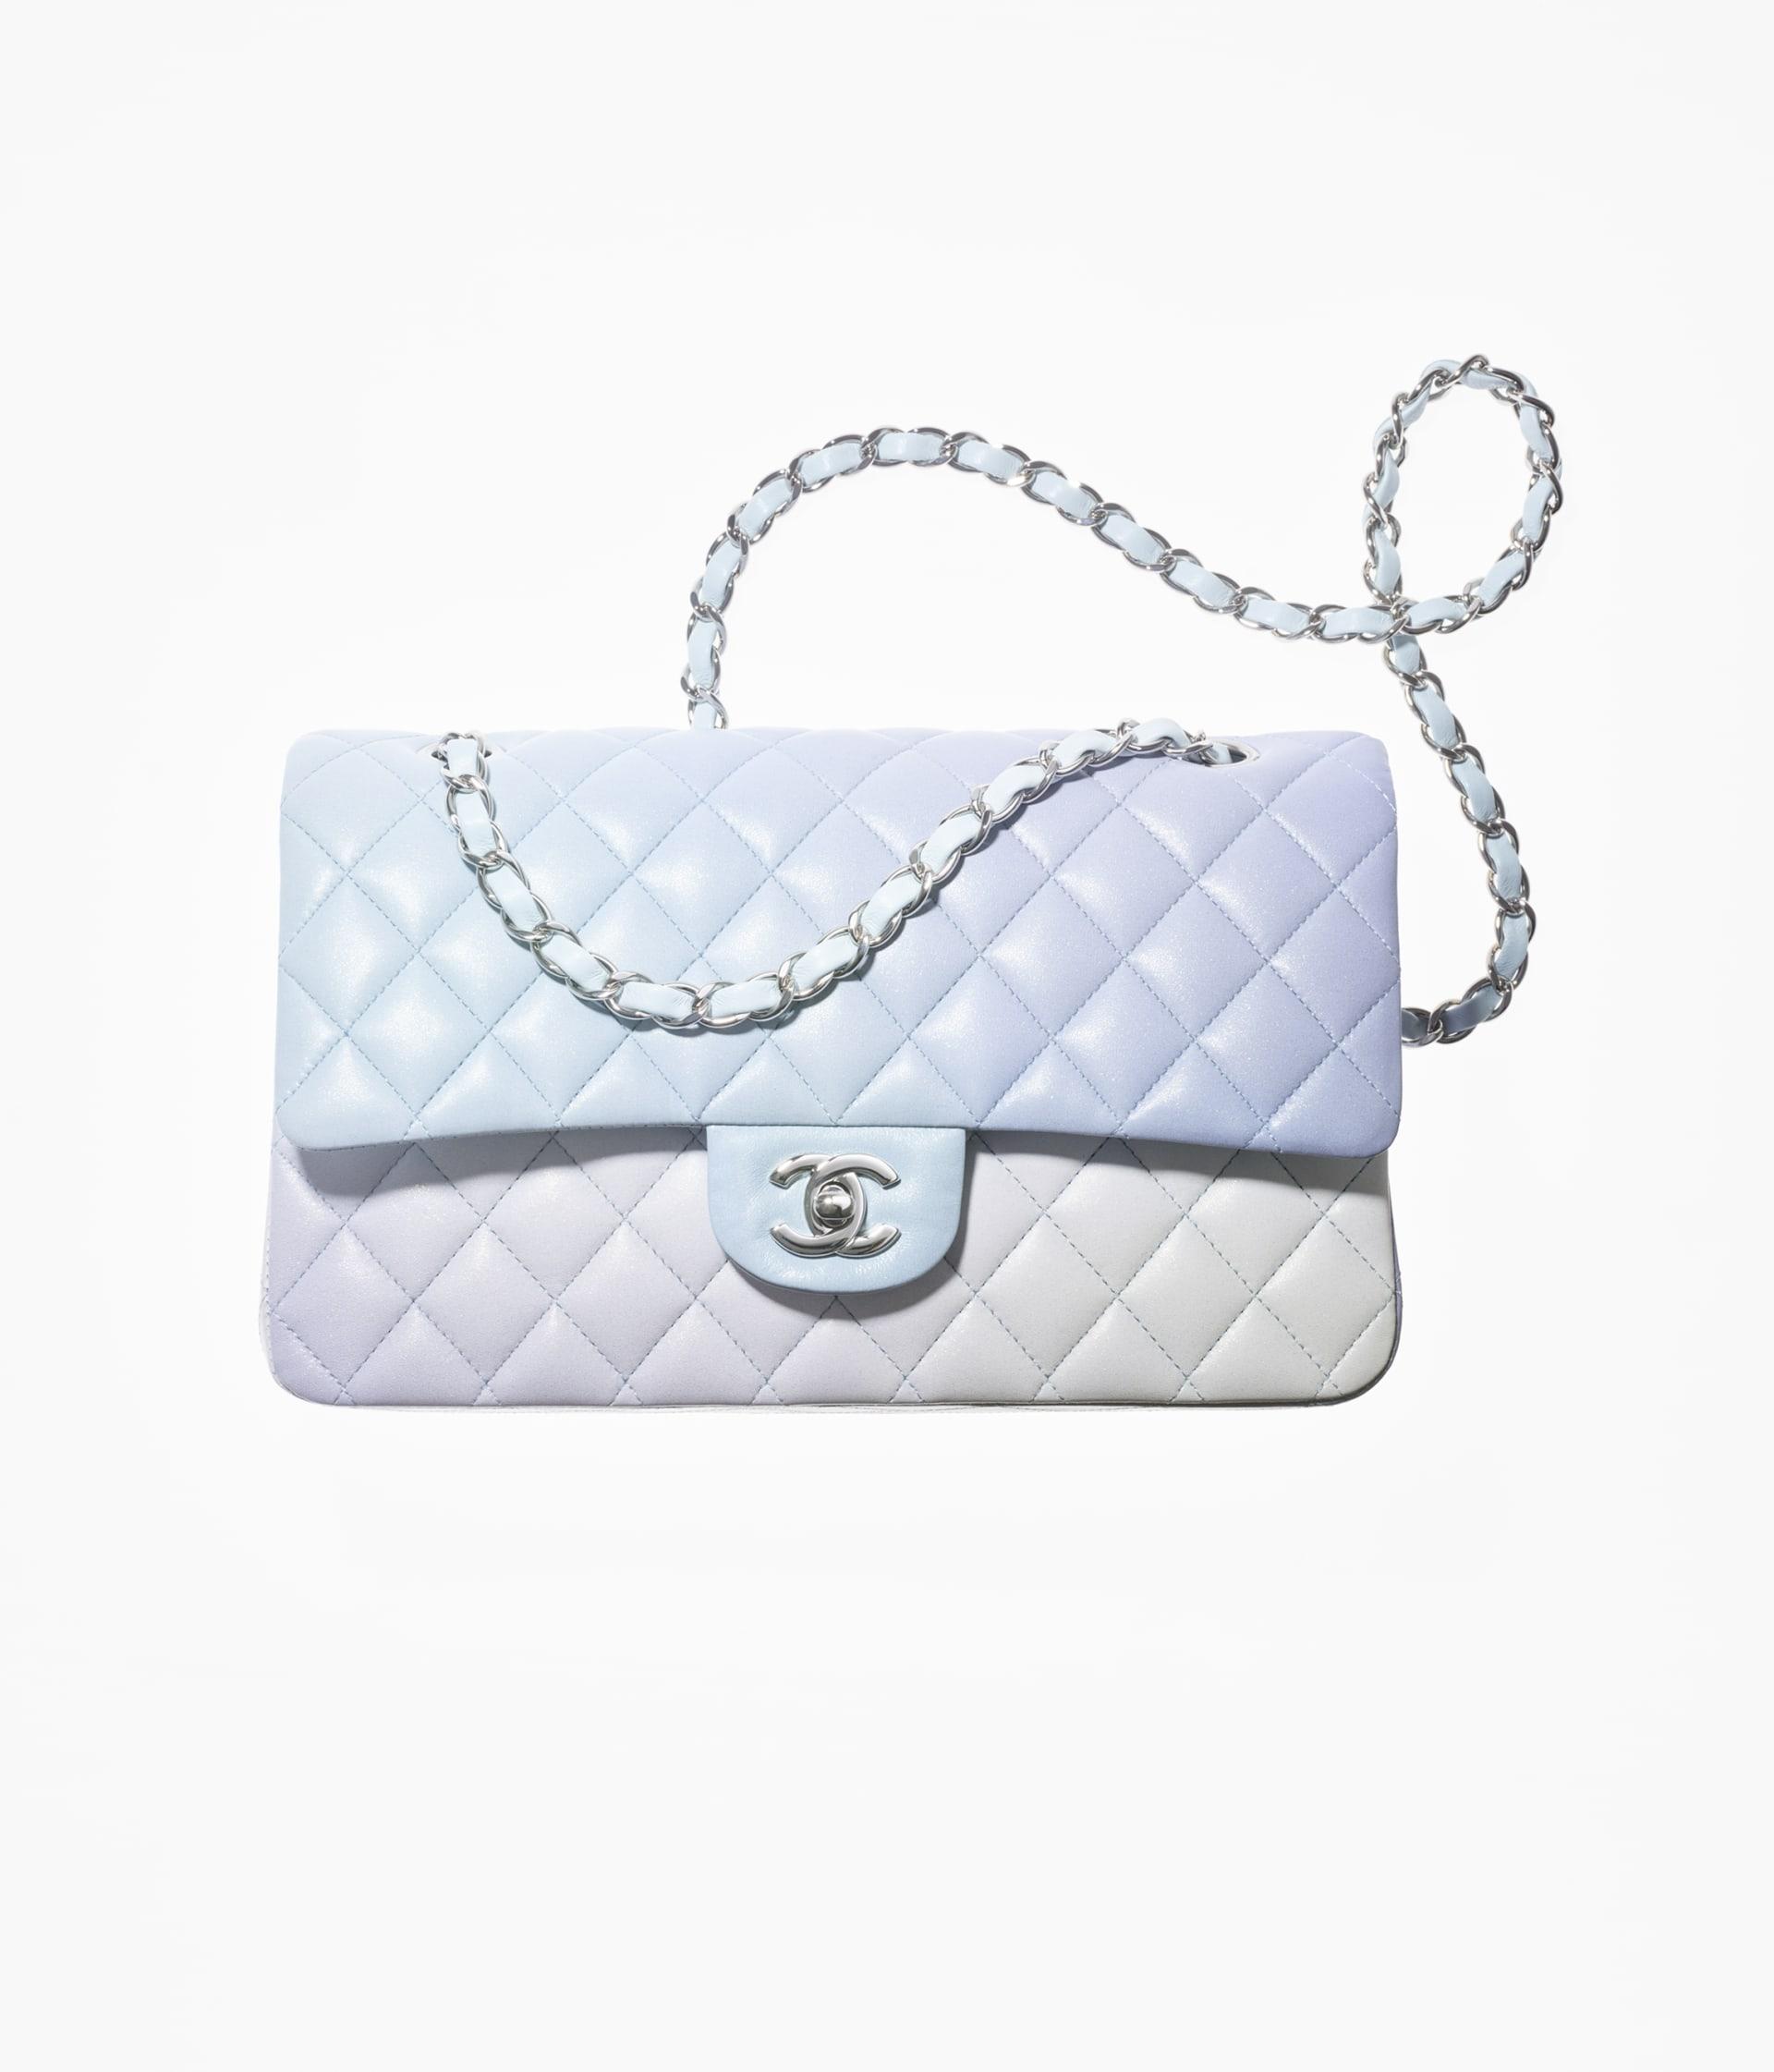 image 1 - Classic Handbag - Perforated Lambskin & Silver-Tone Metal - Light Blue, Light Purple & White